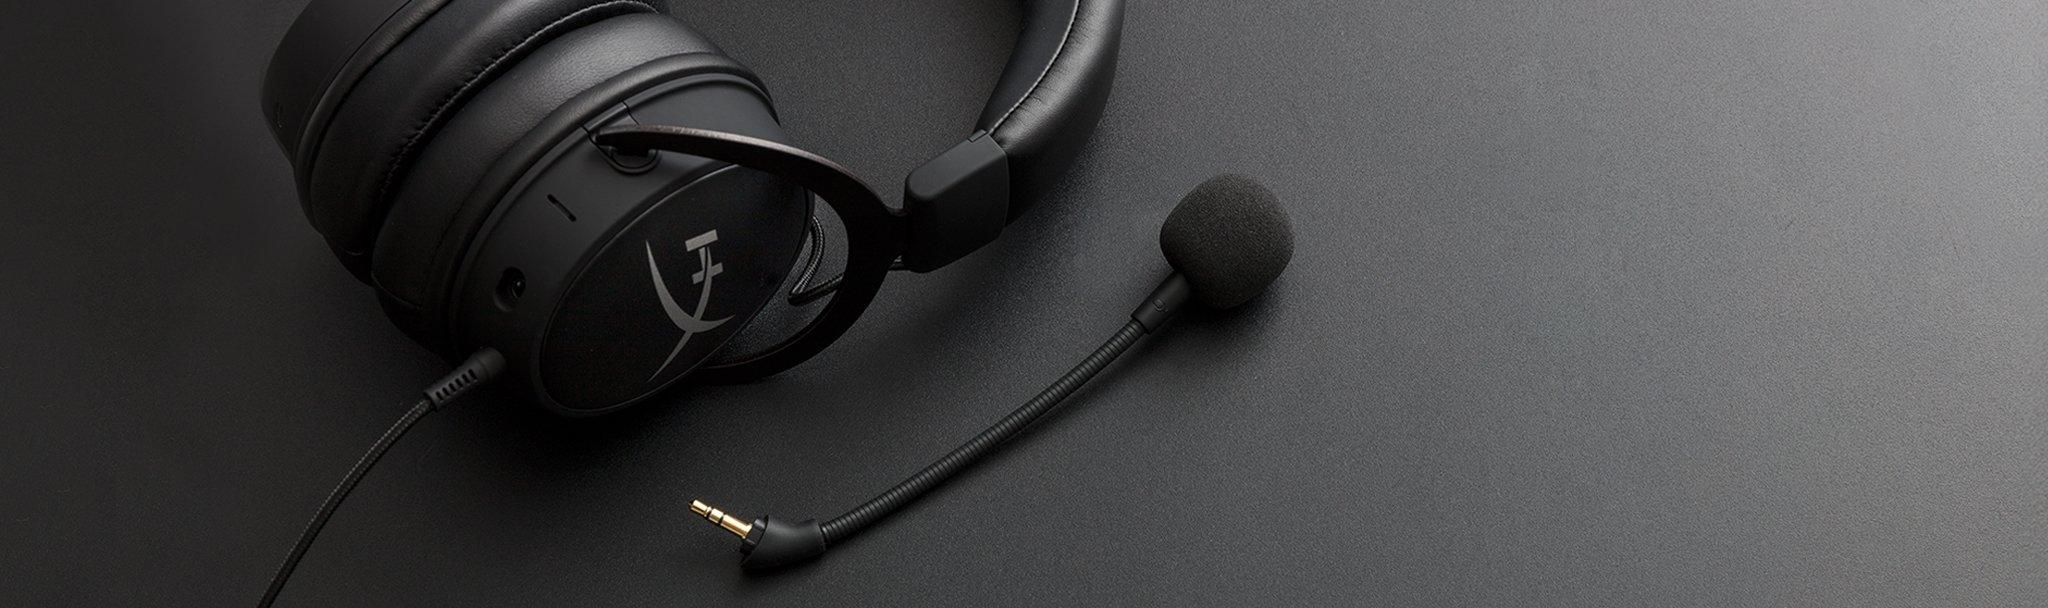 hx-features-headset-cloud-mix-5-lg